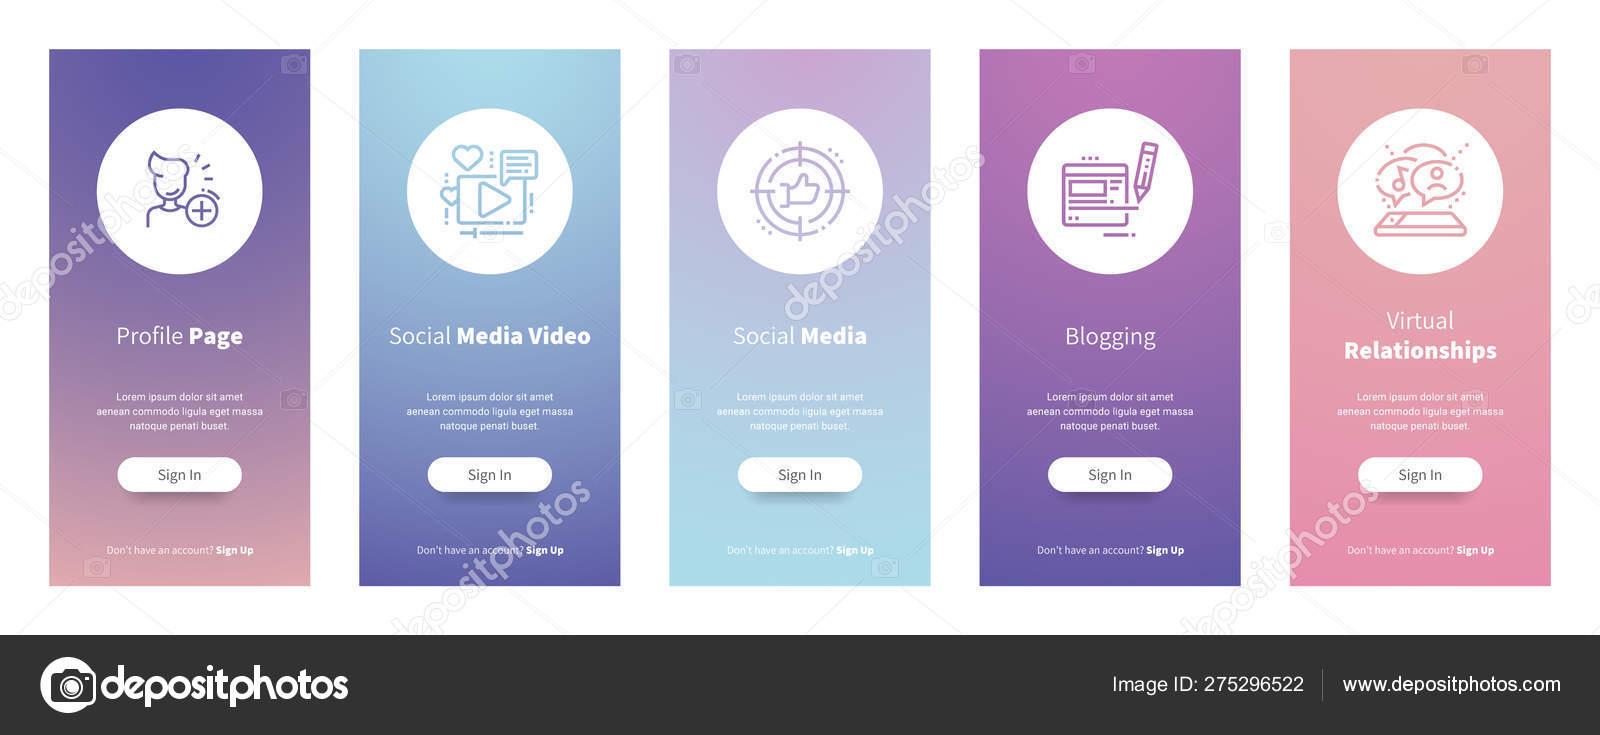 Profile Page Social Media Video Social Media Blogging Virtual